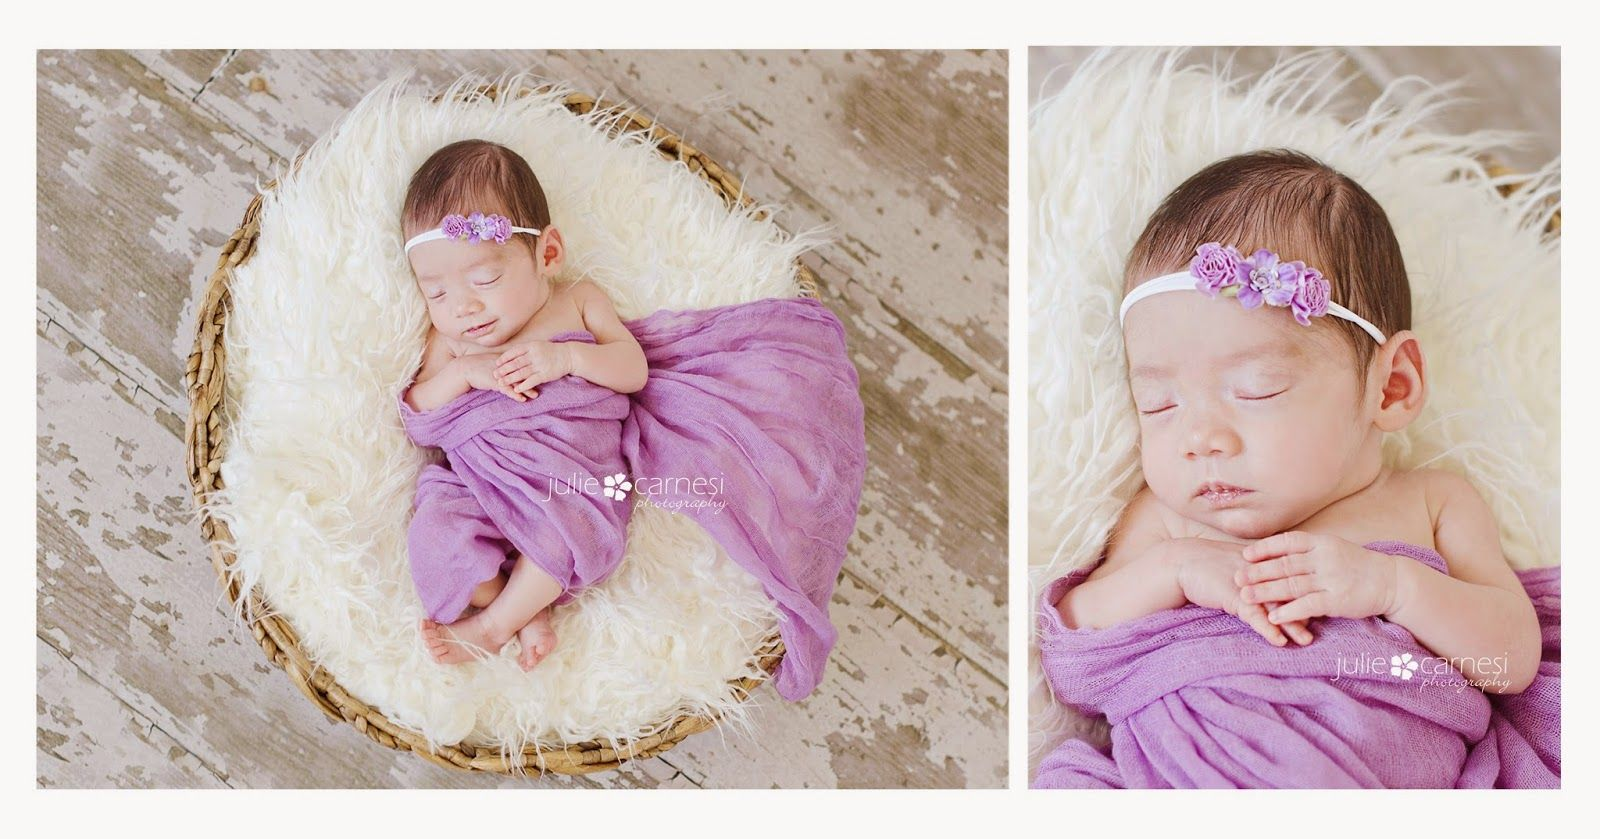 Julie Carnesi Photography | Newborn Girl Photography